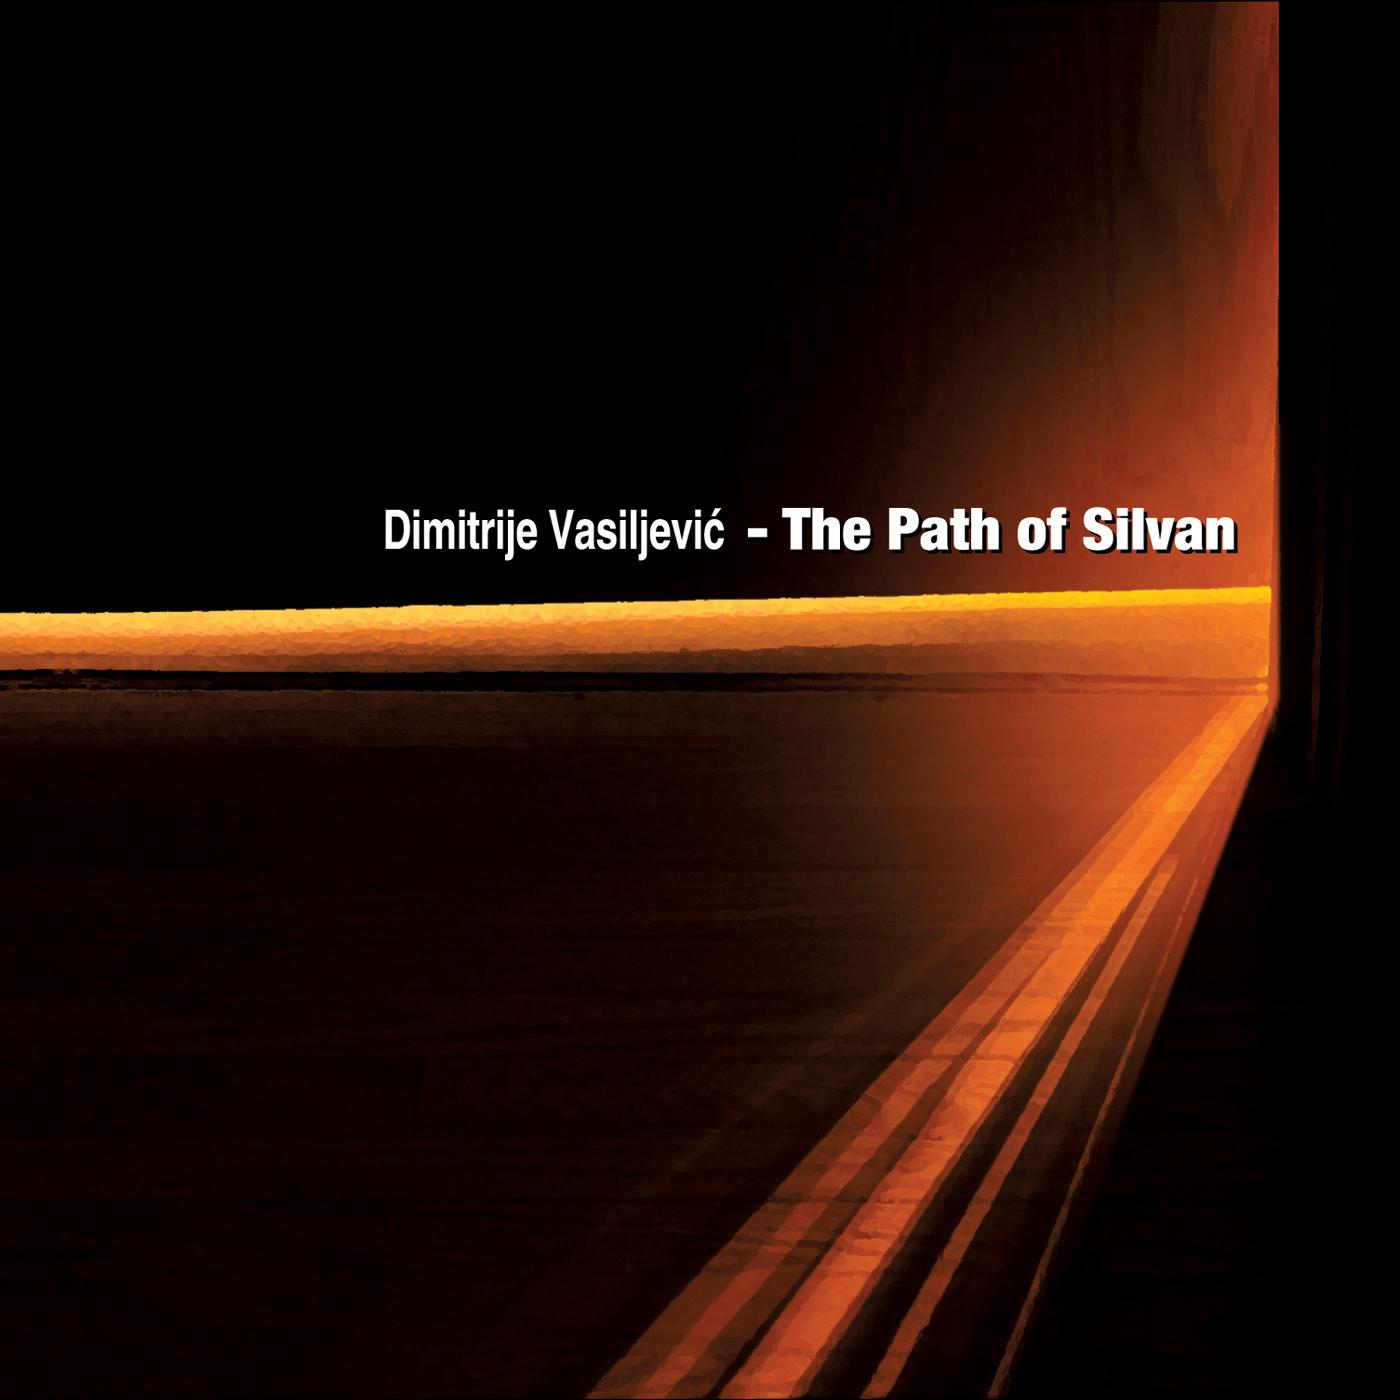 The Path of Silvan (2013)